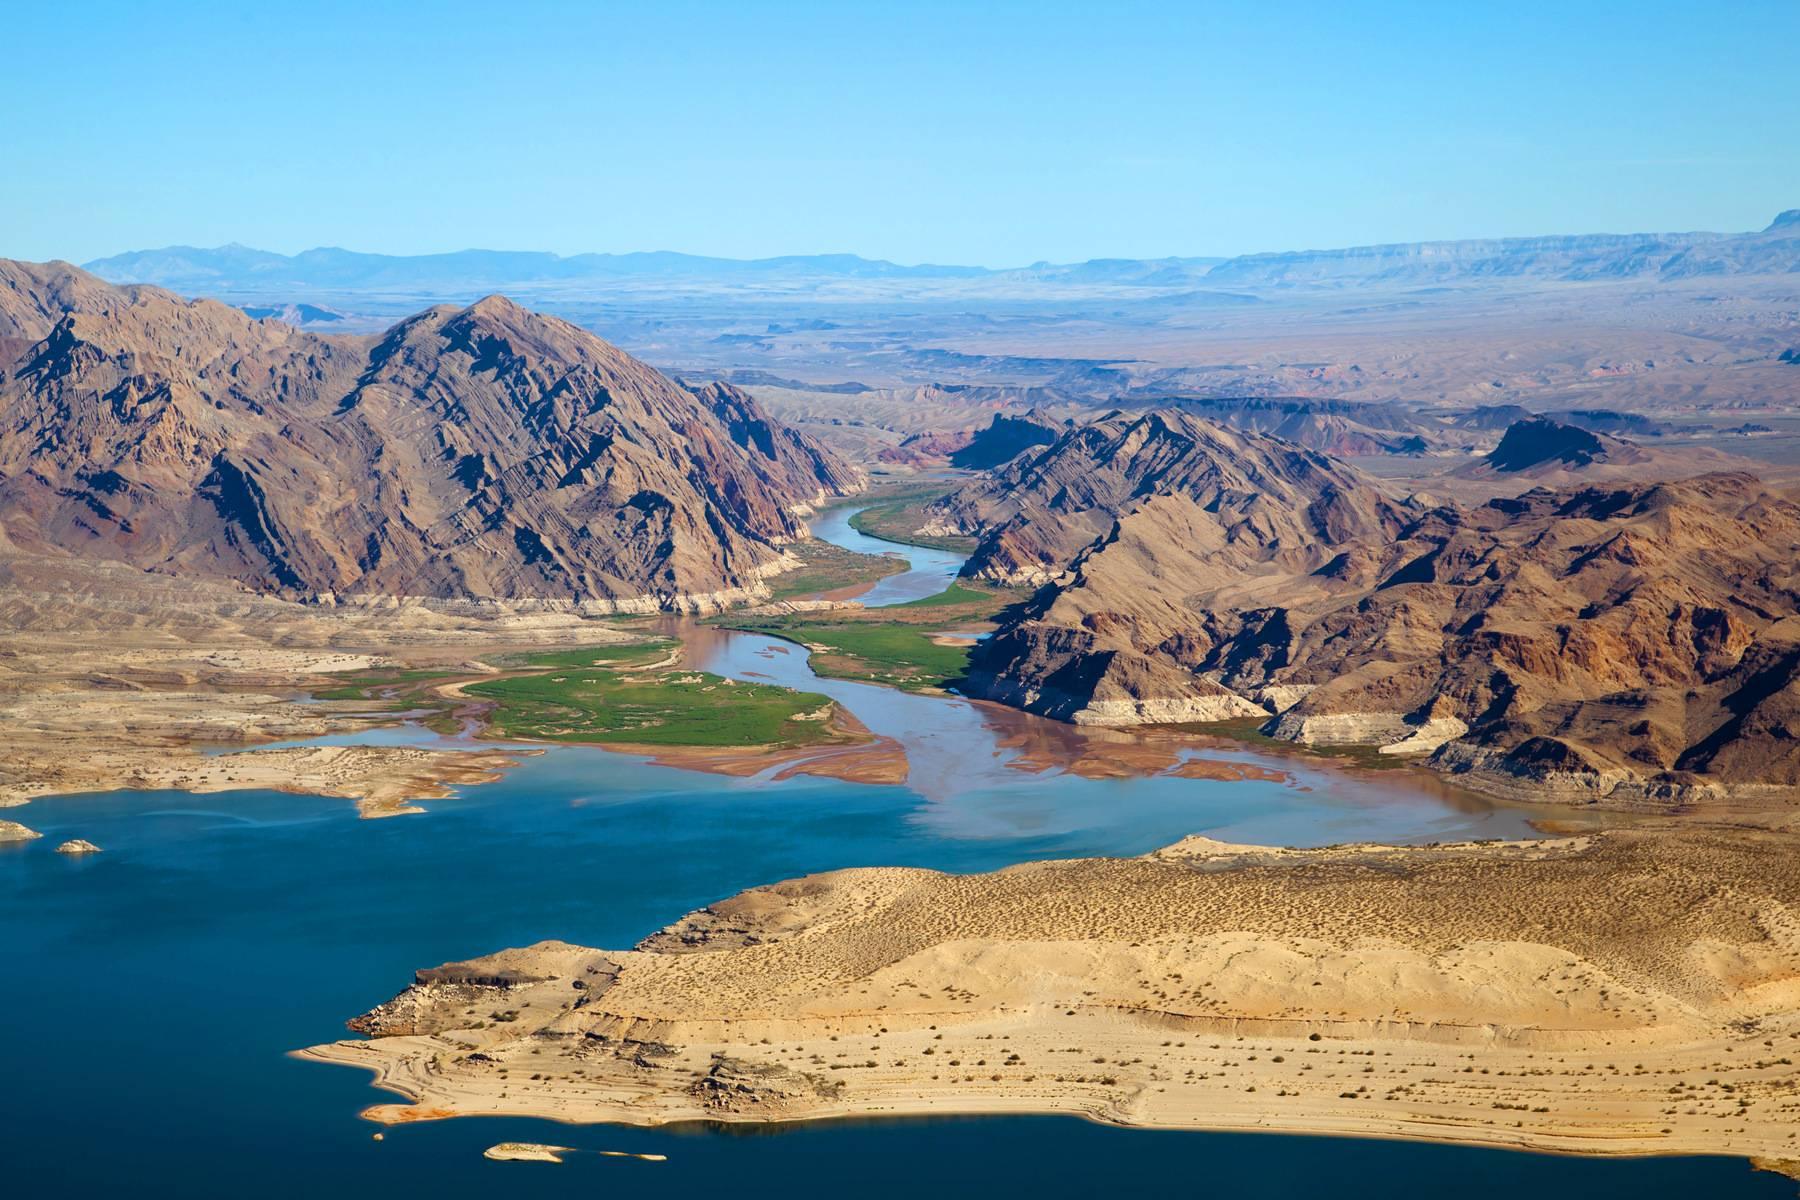 Natural Wonders Of The United States Boulder City Amp Lake Mead Ziplining Tour Tours4fun